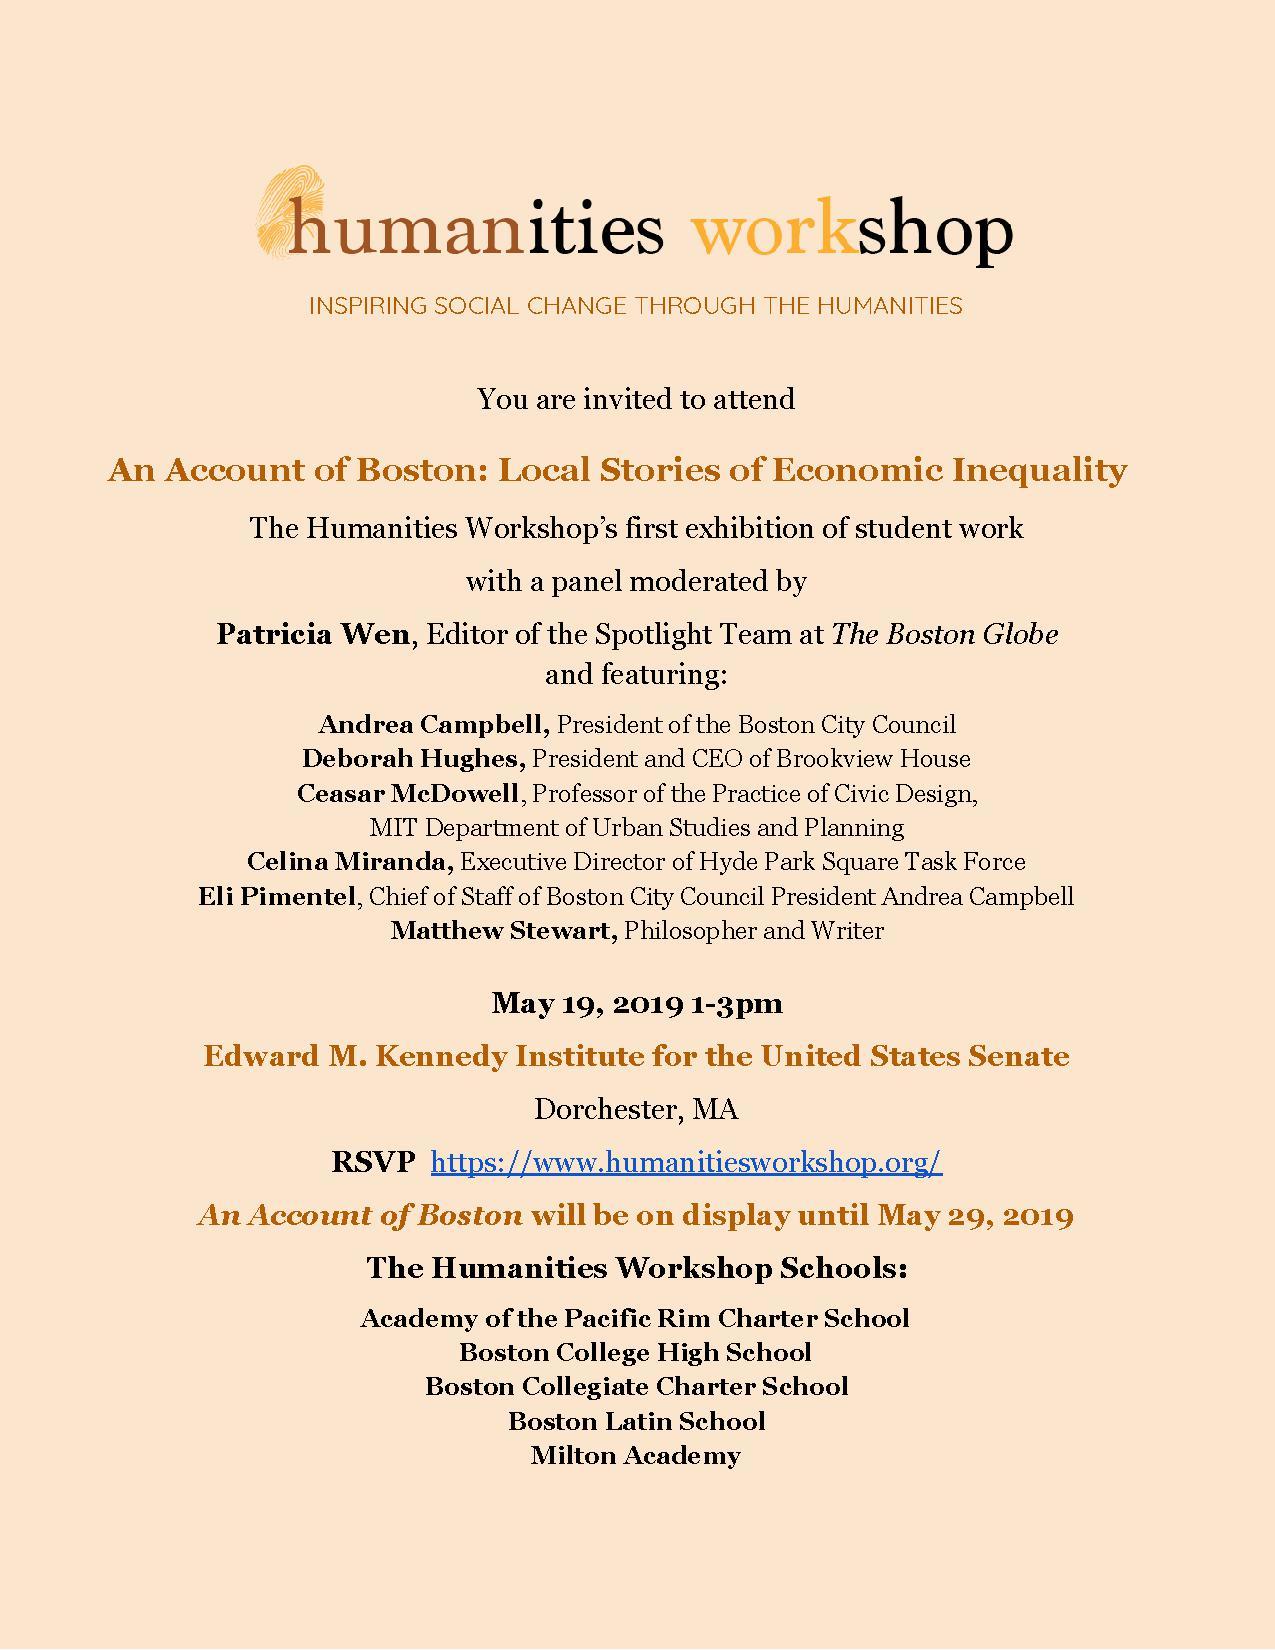 Humanities Workshop Invitation.jpg